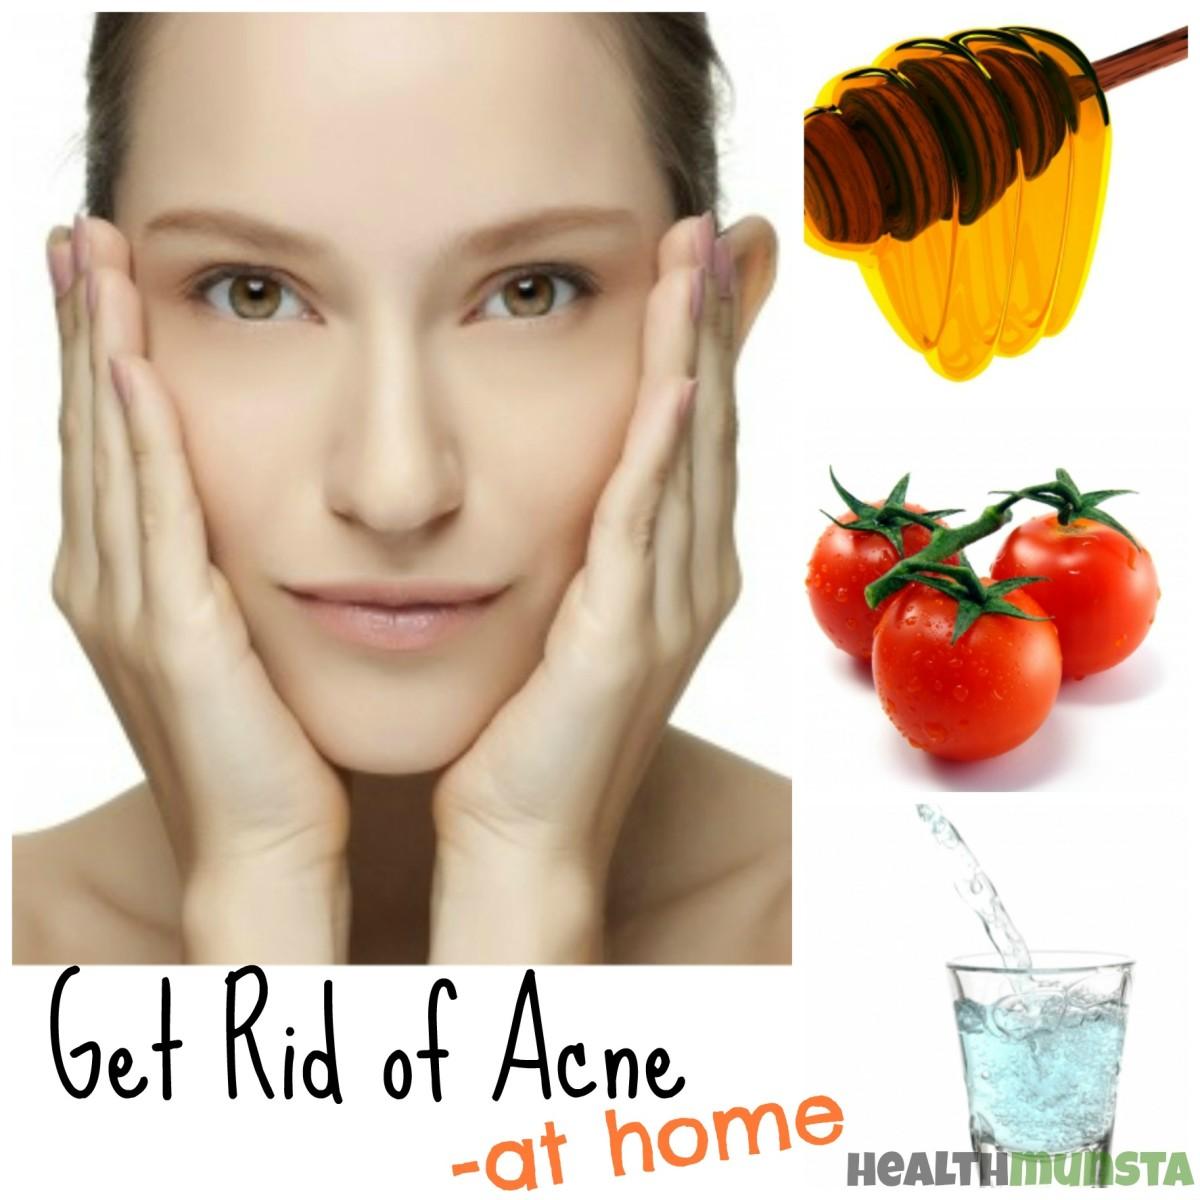 Get Rid of Acne at Home - Using Natural Remedies & Good Habits